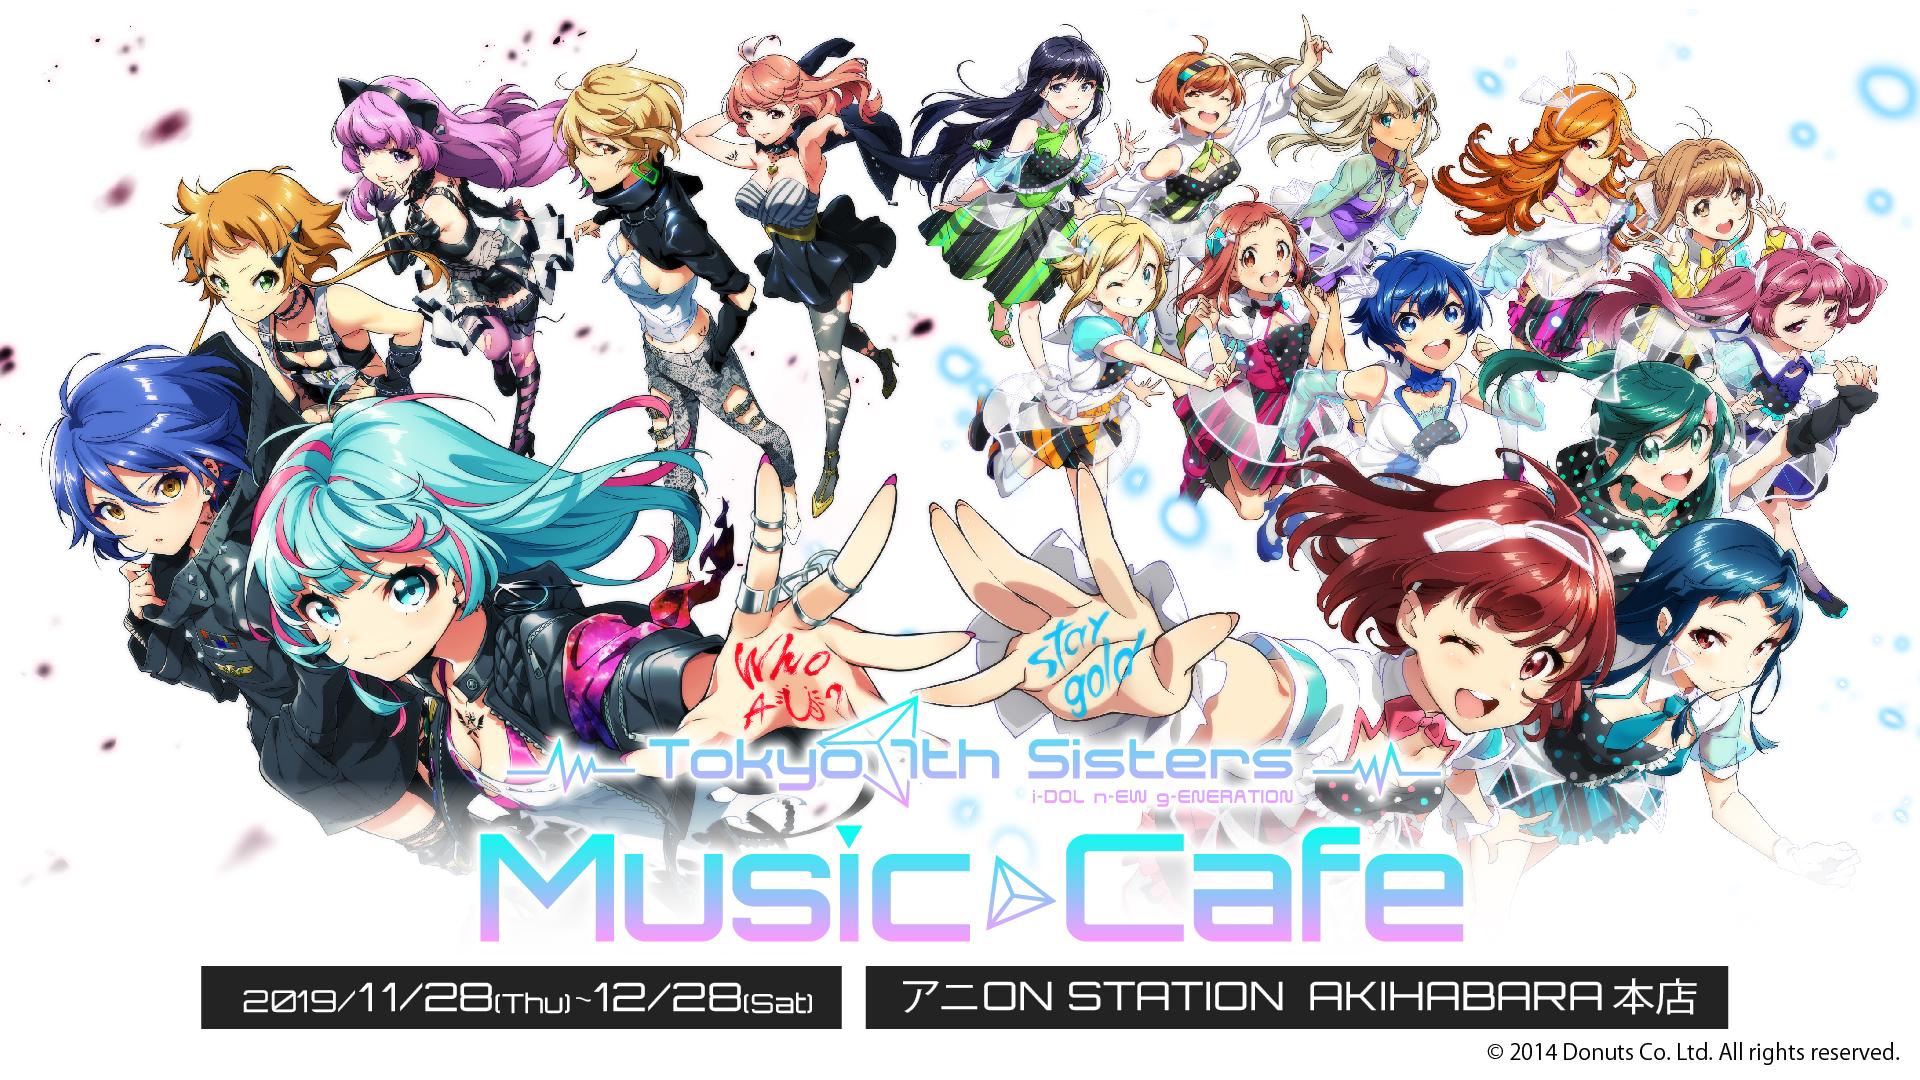 『Tokyo 7th Sisters Music Cafe(トーキョー セブンス シスターズ ミュージック カフェ)』 11月28日(木)より期間限定オープン!